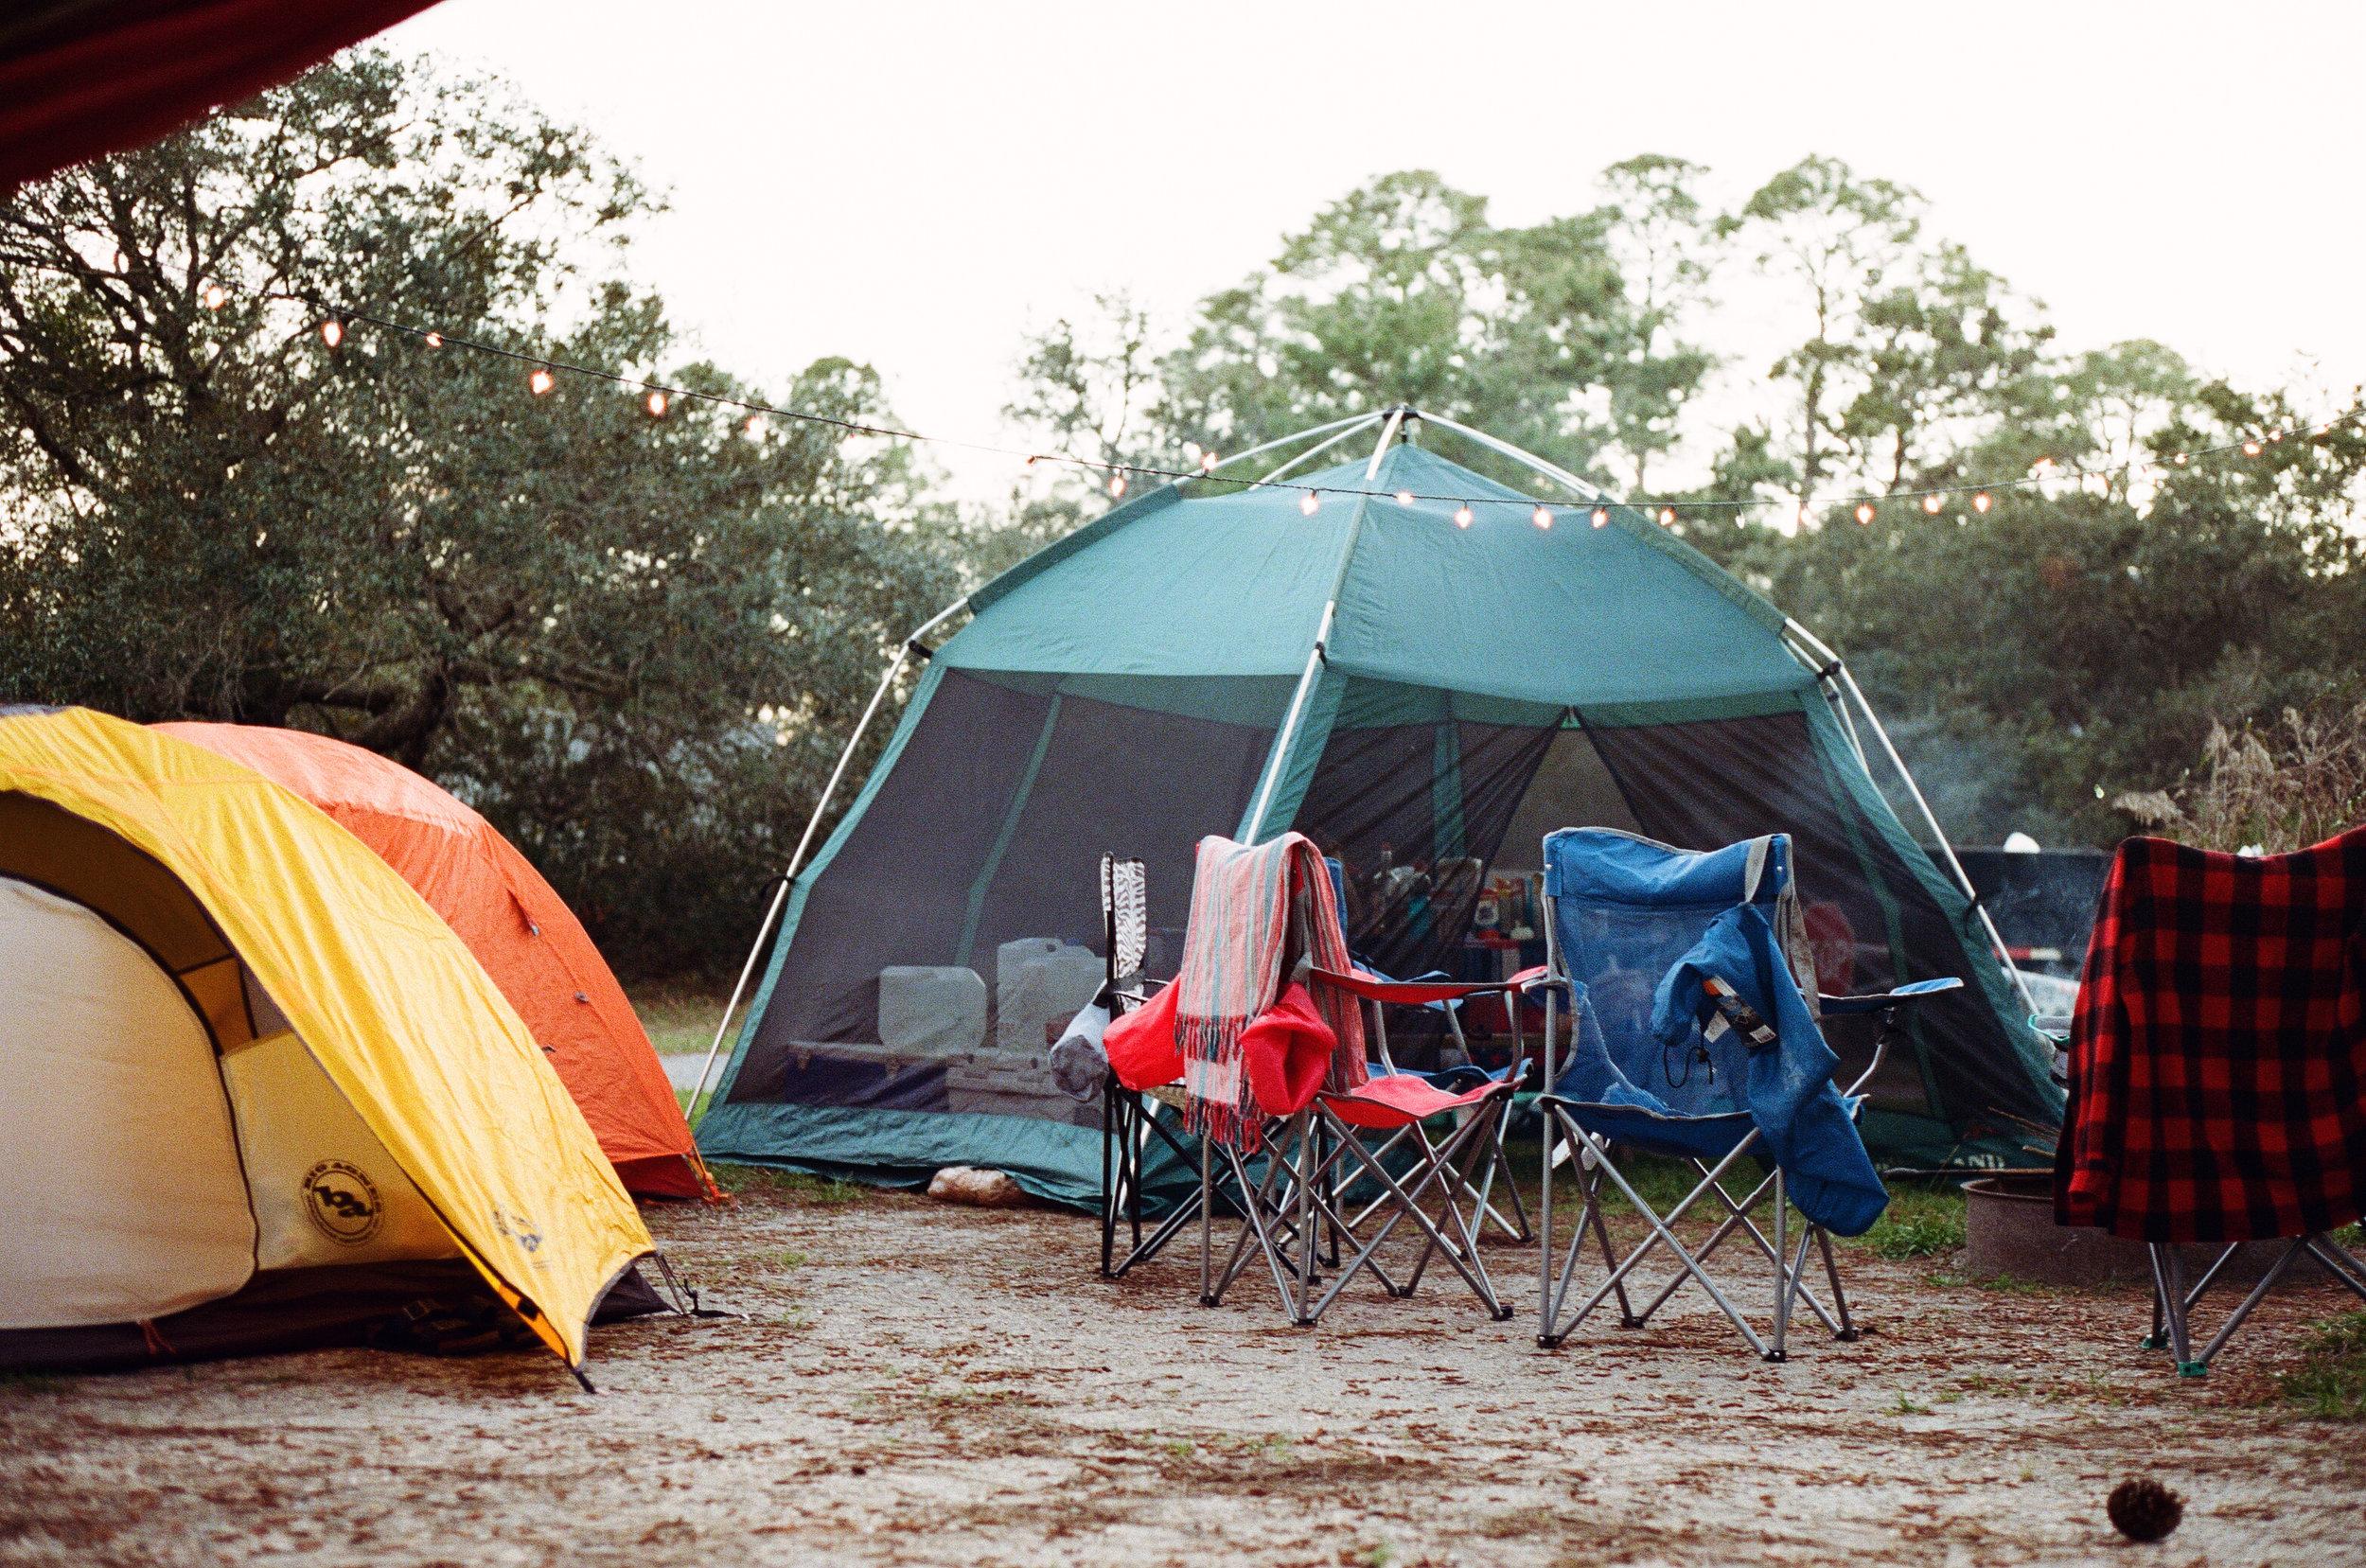 iheartbueno_Camping_BigLagoon-000150130019.jpg